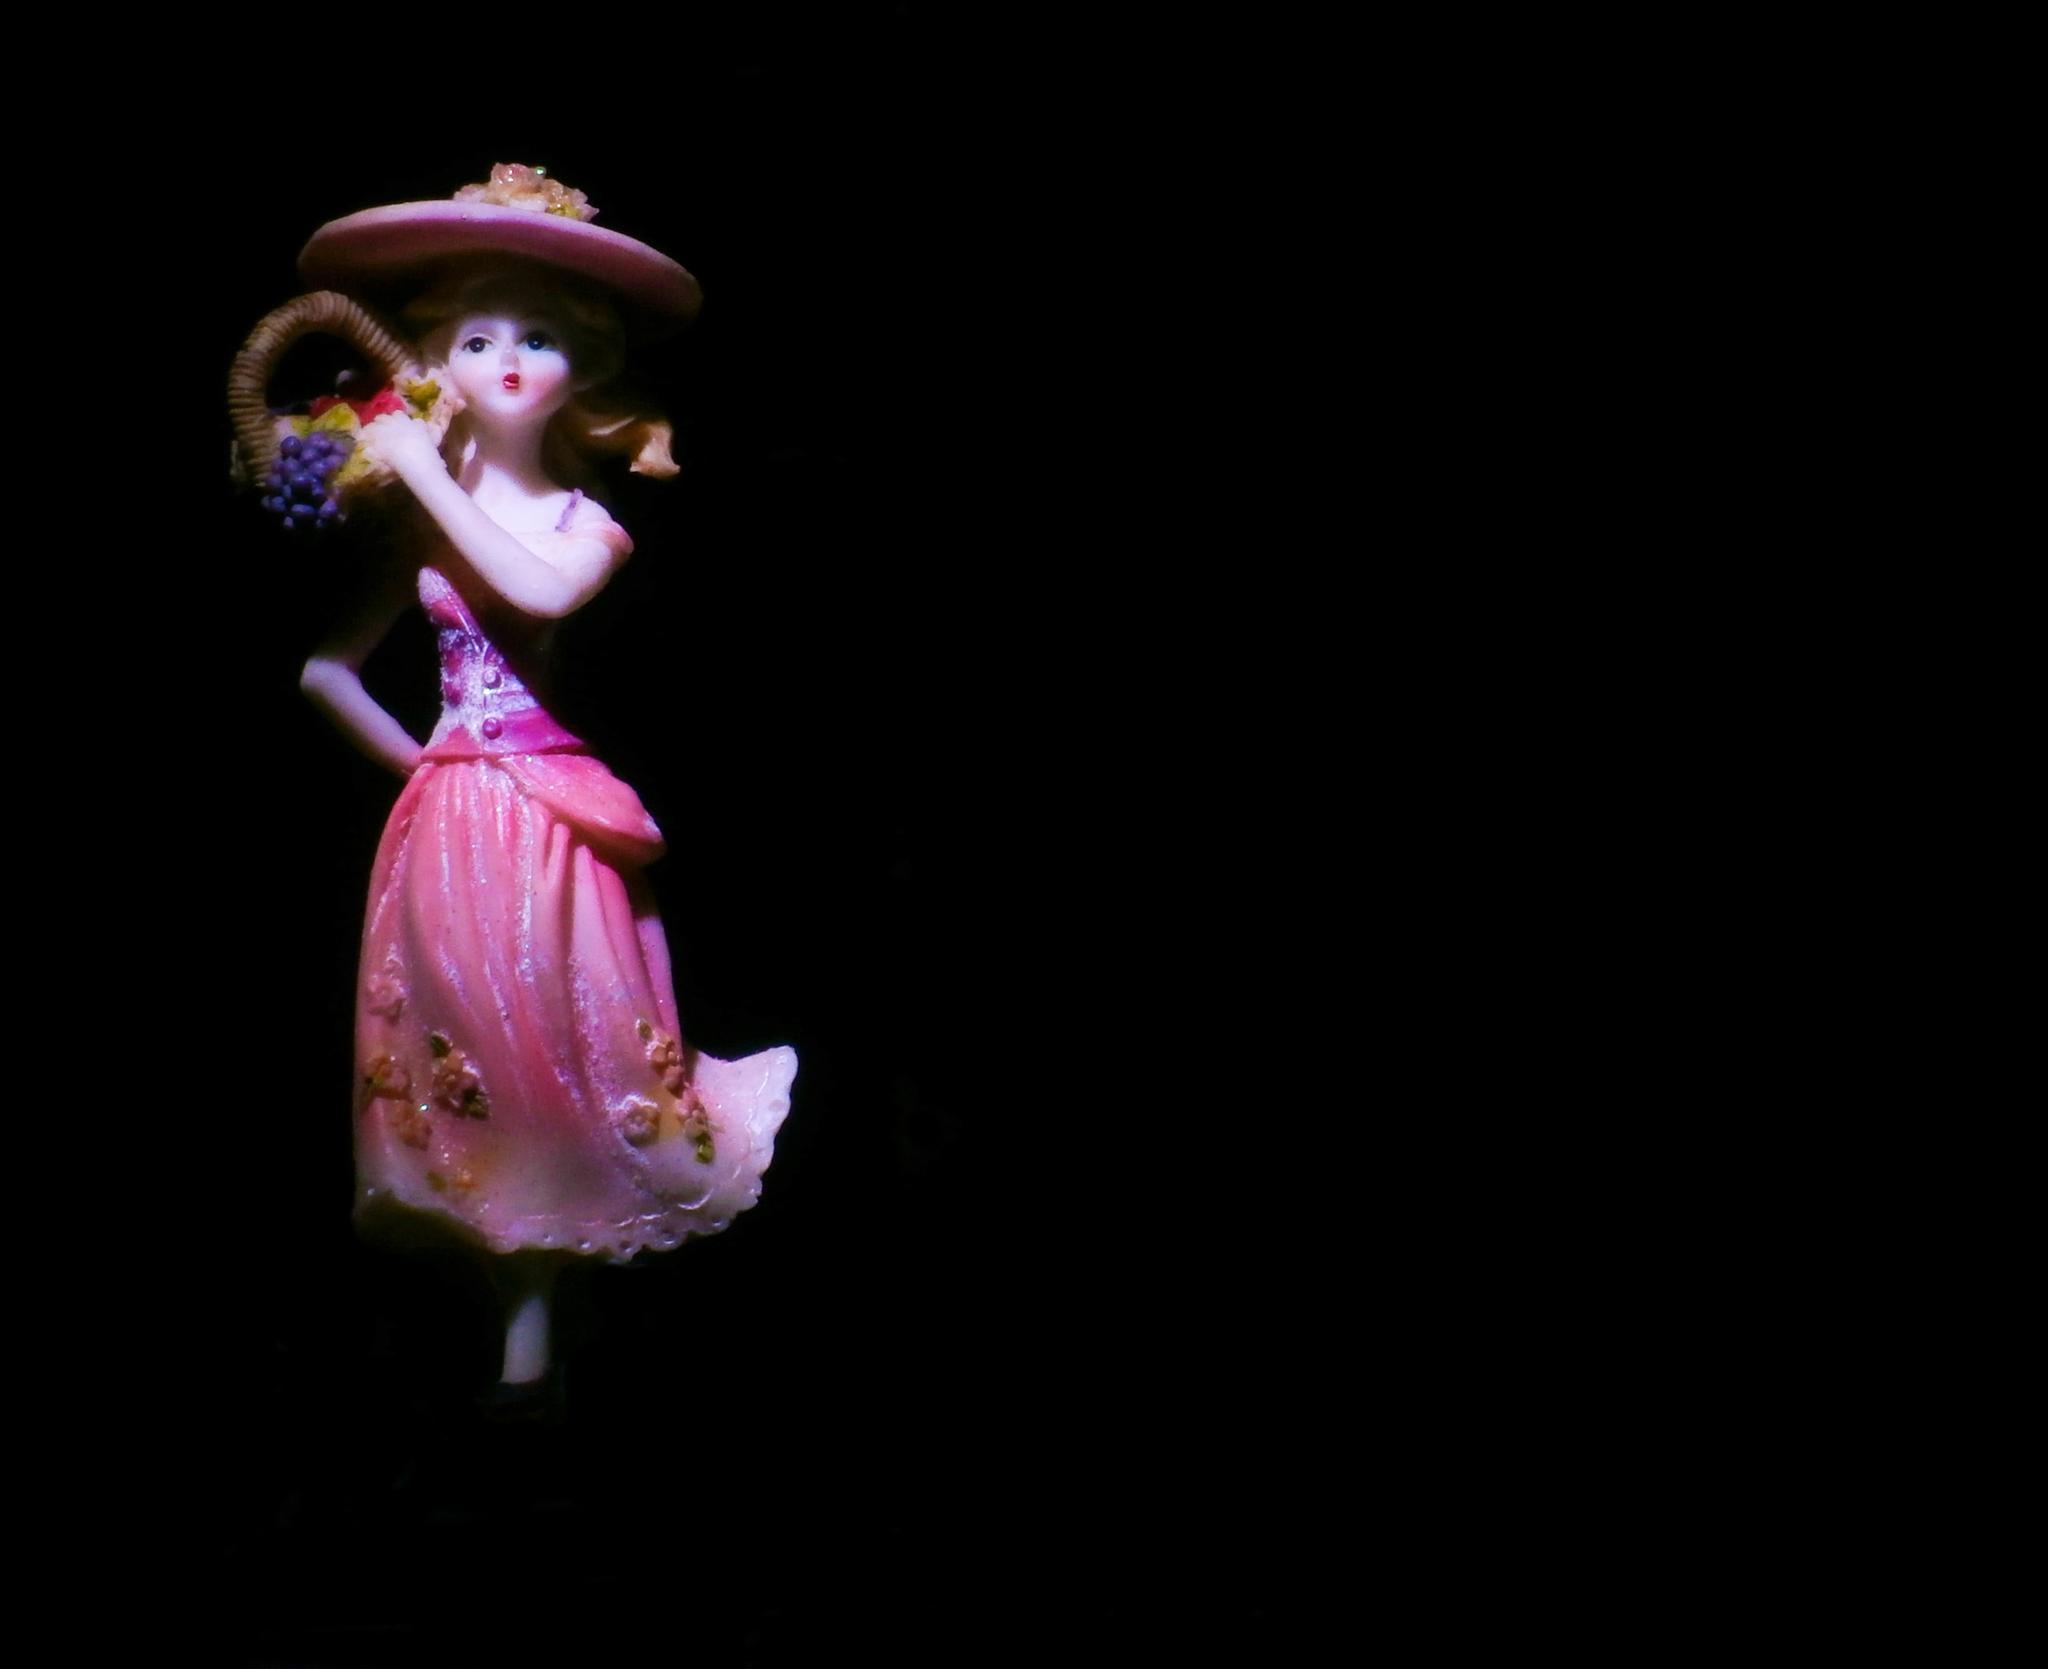 Doll by Reuben Kinny